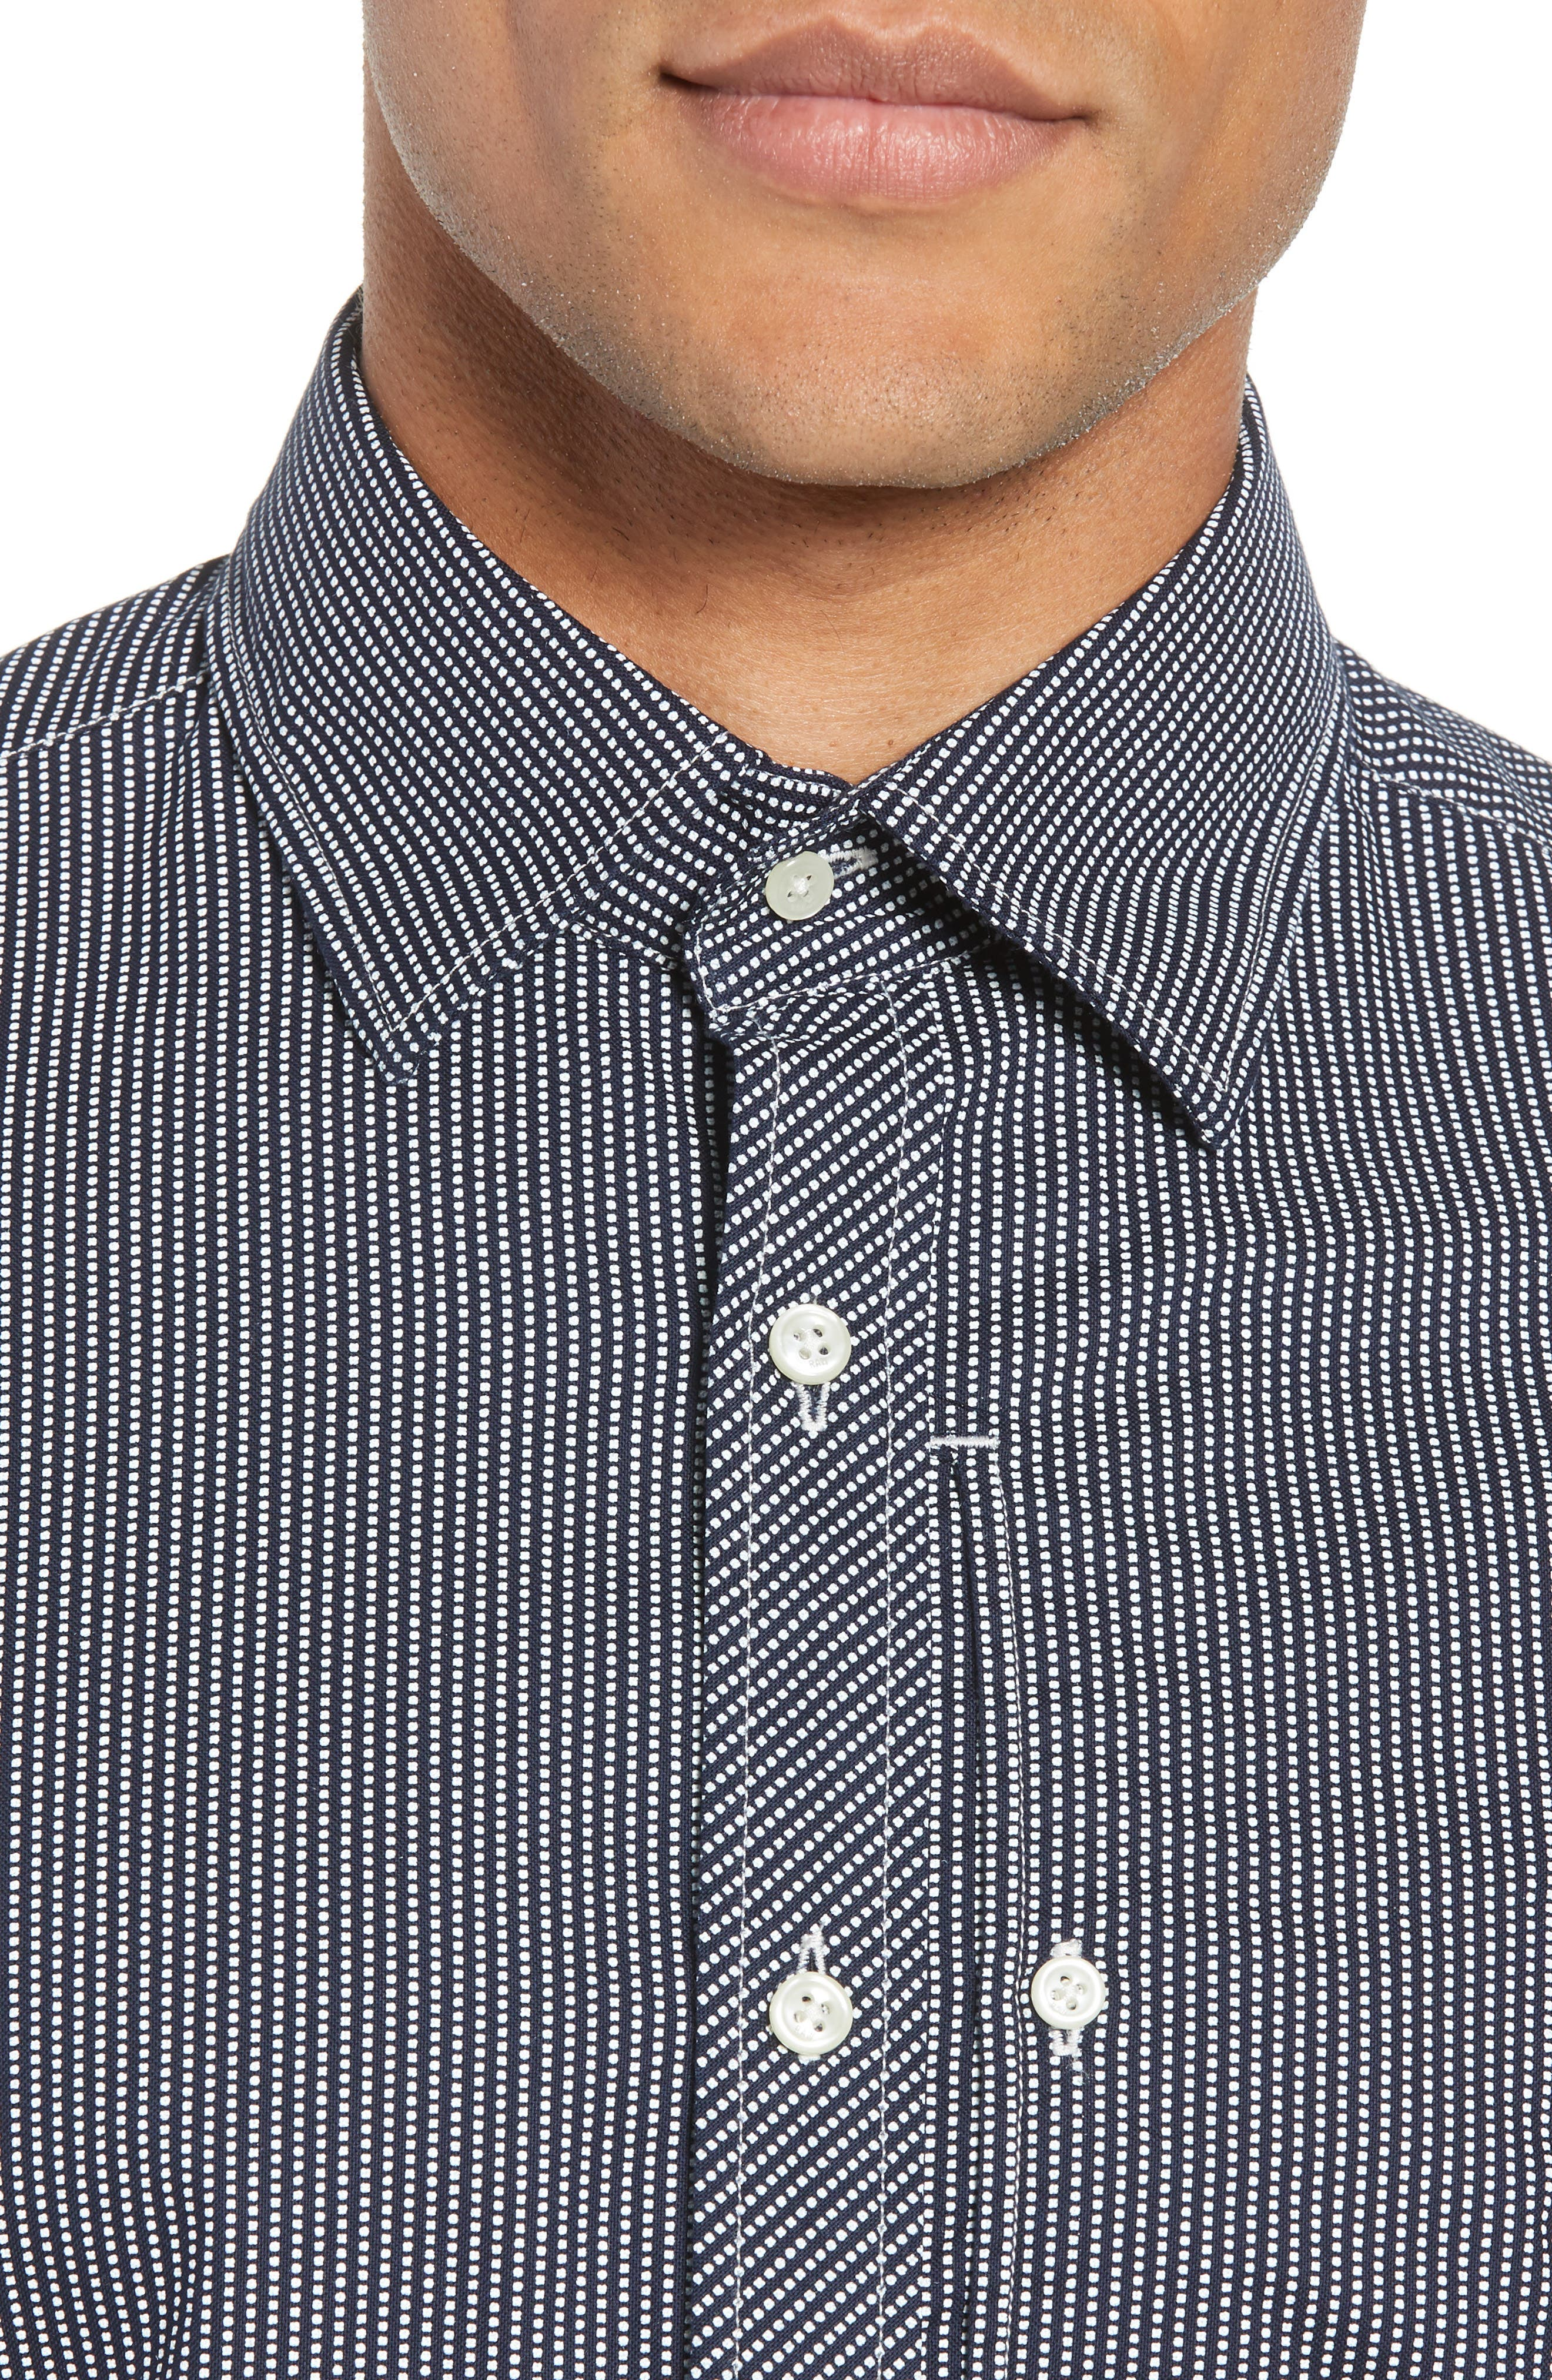 Bristum Straight Ref Shirt,                             Alternate thumbnail 4, color,                             Sartho Blue/ Milk